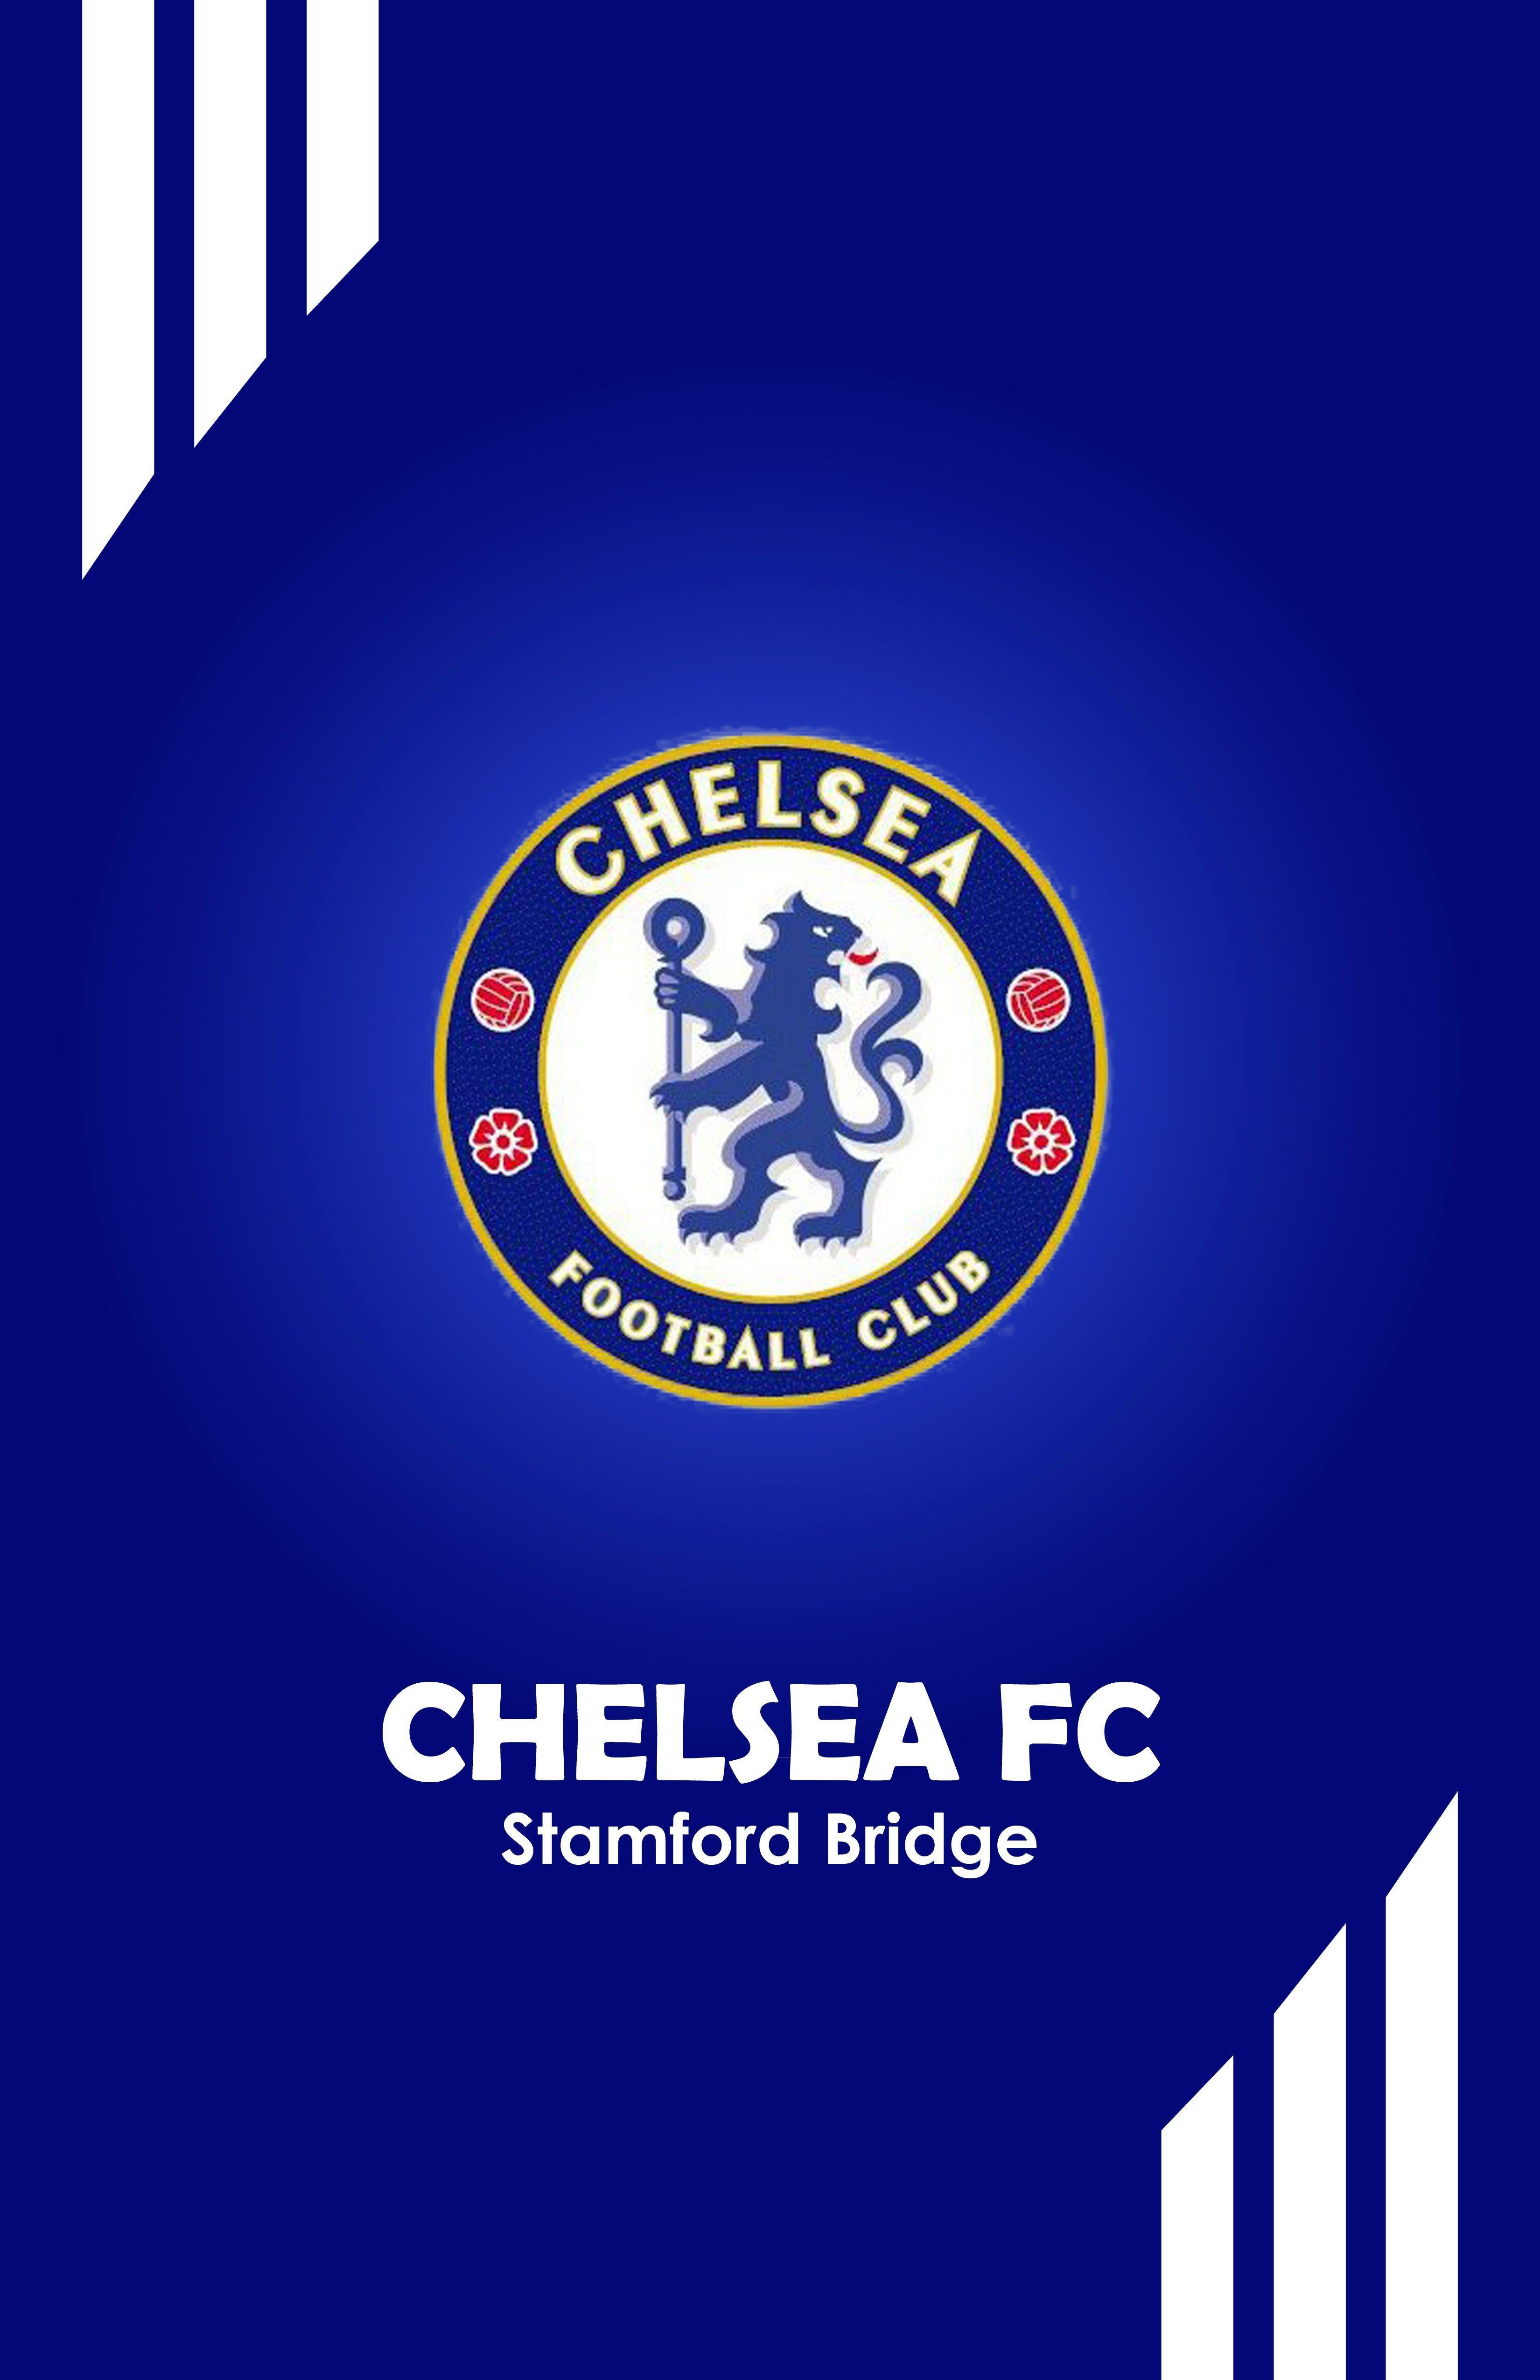 Chelsea Fc Badge : Hd Wallpaper Chelsea Fc Logo Blue And White Chelsea ...